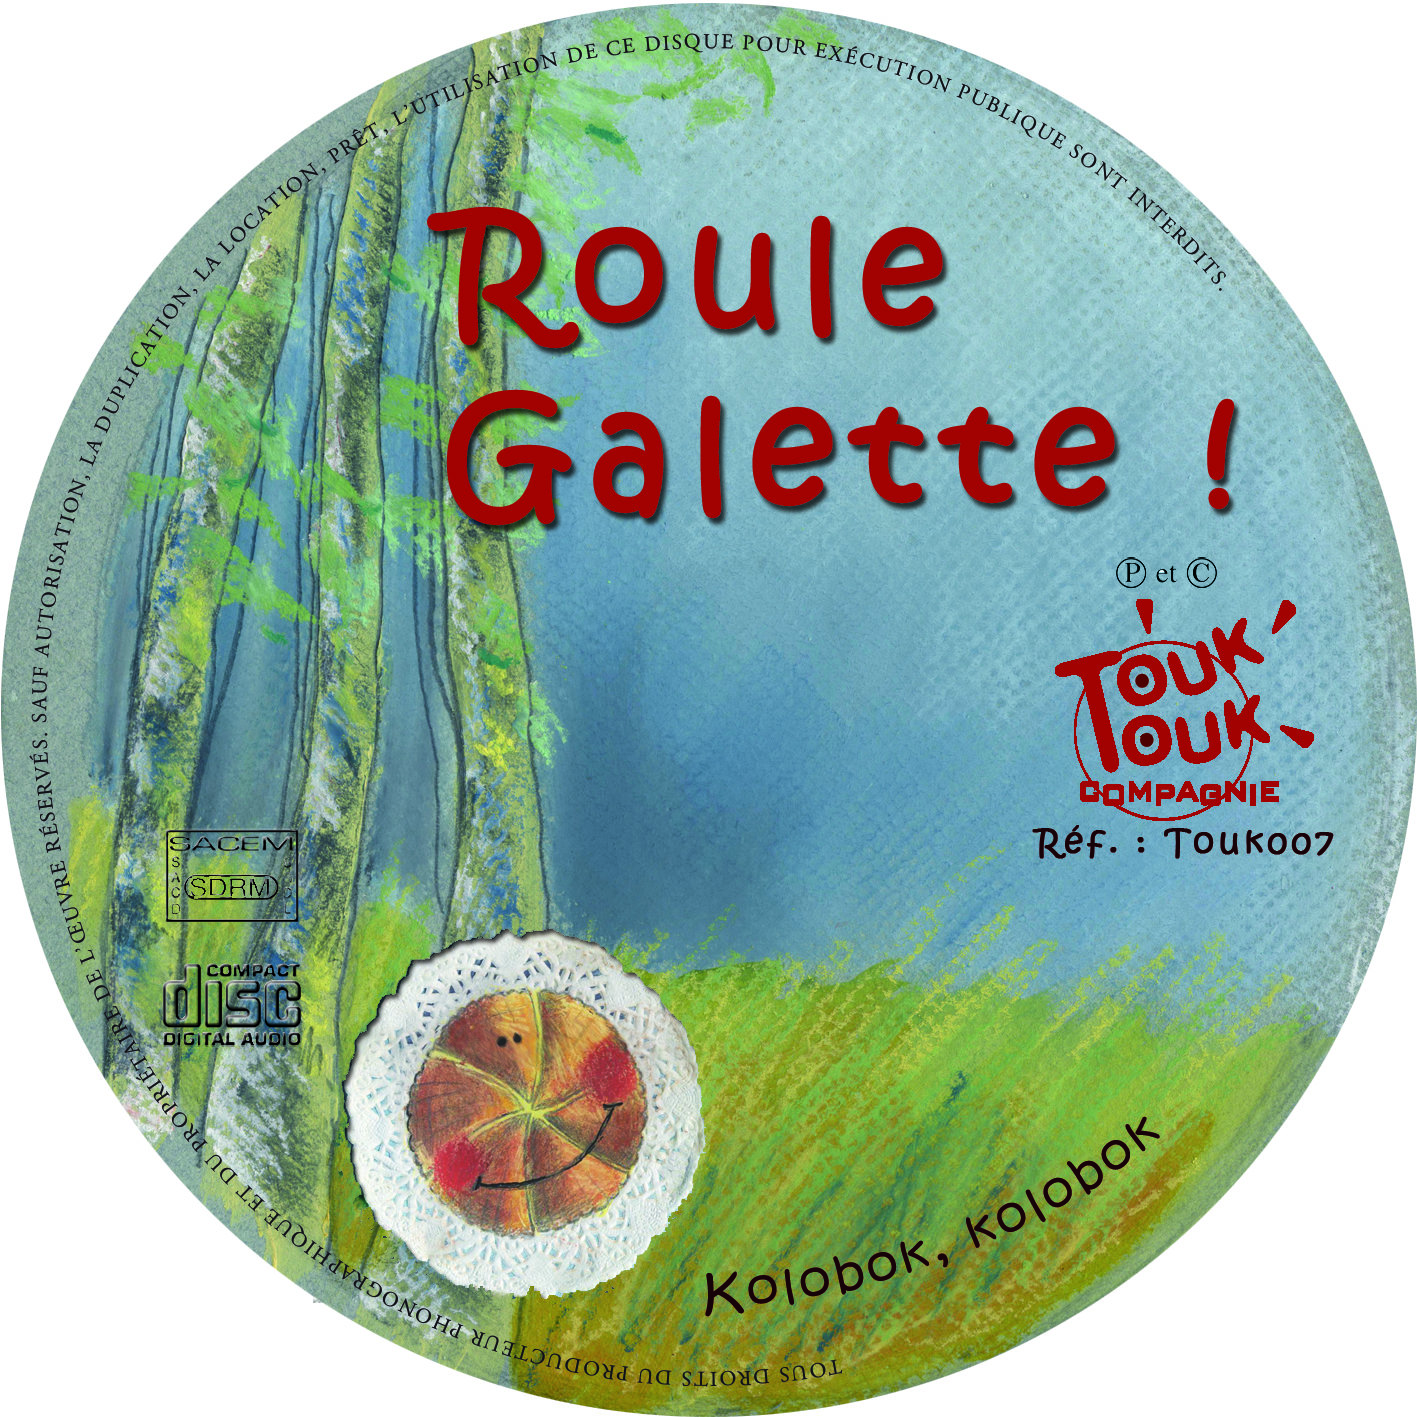 CD roule galette 00005